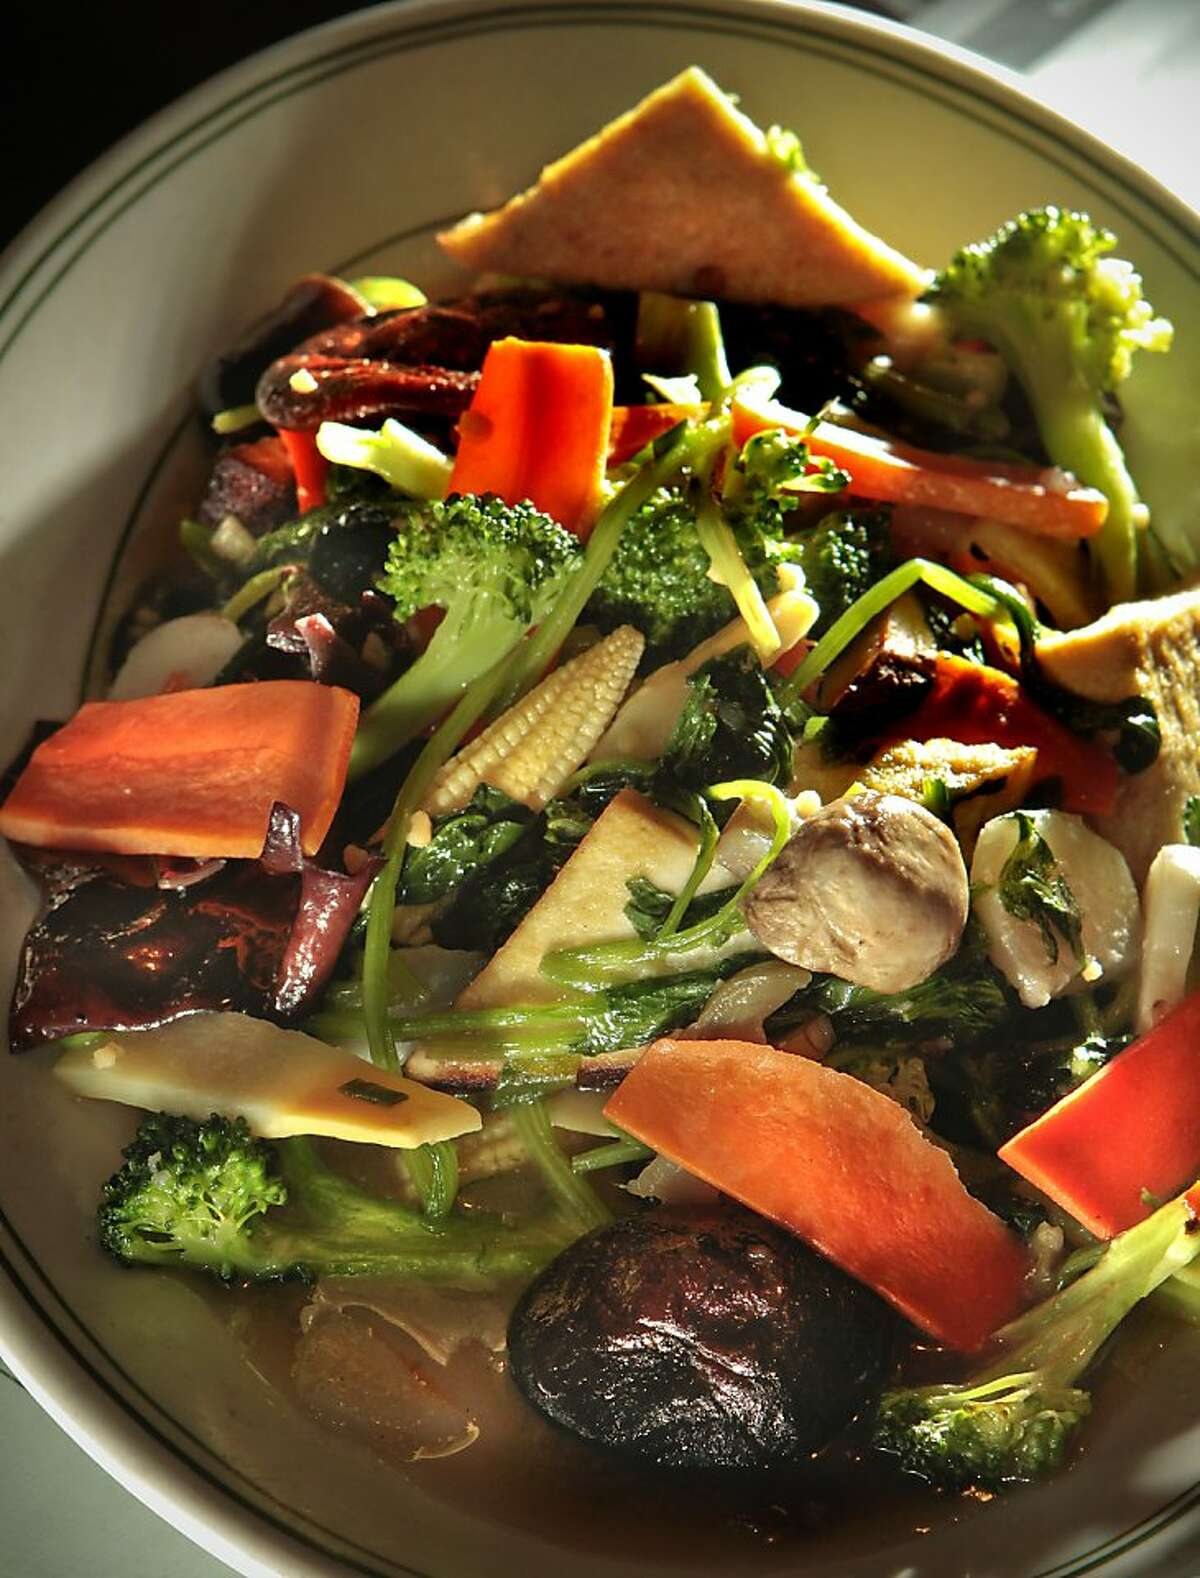 Shangri-La Special Combination Vegetables at Shangri-La Vegetarian Restaurant in San Francisco, Calif., is seen on July 8th, 2011.